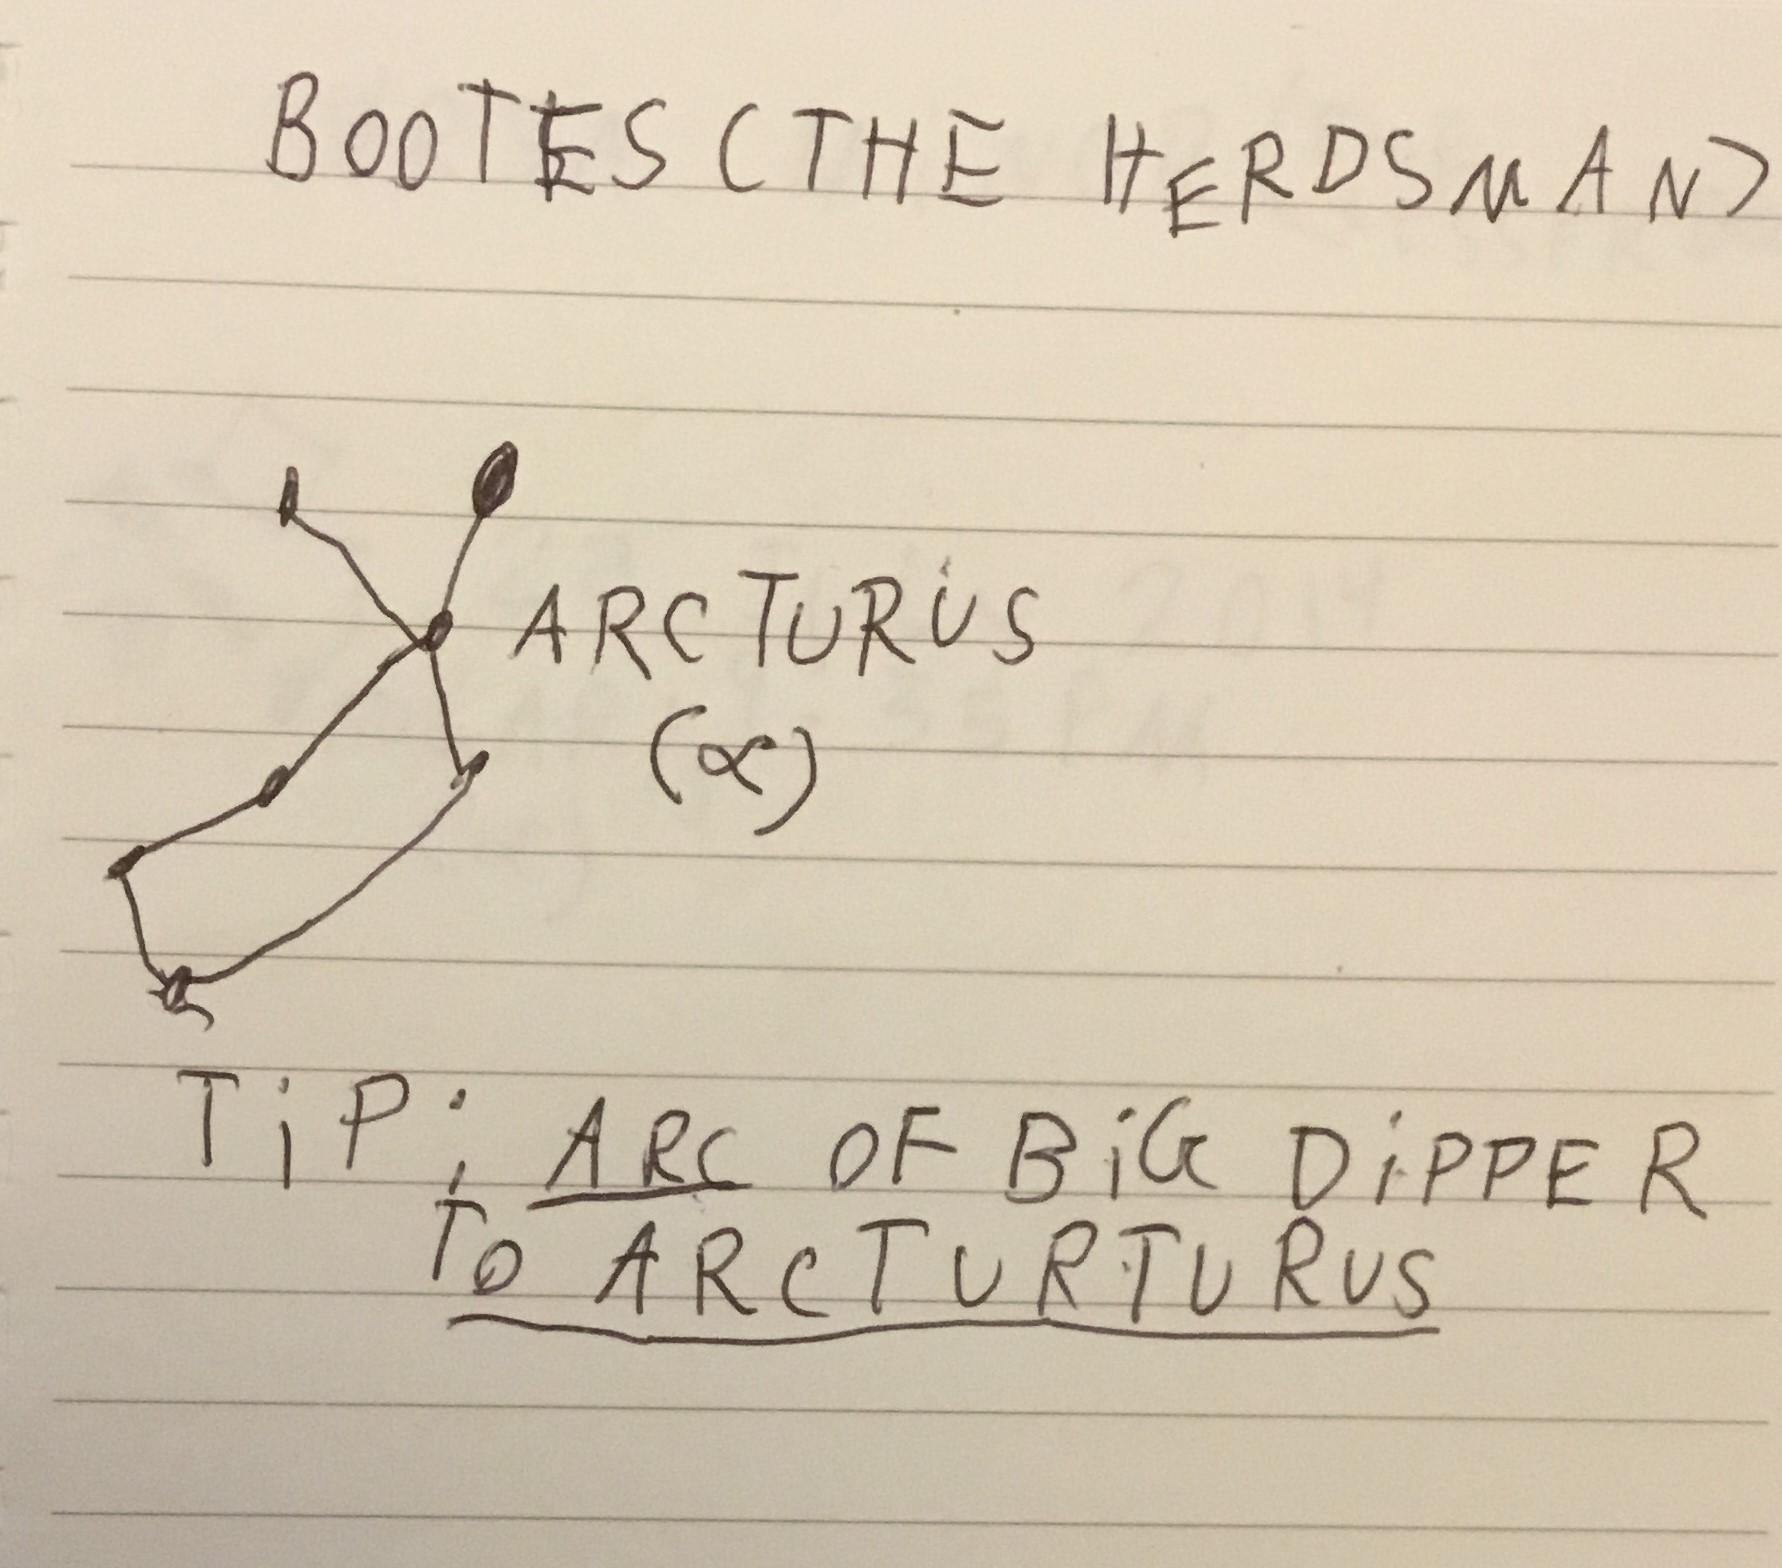 Boots Constellation